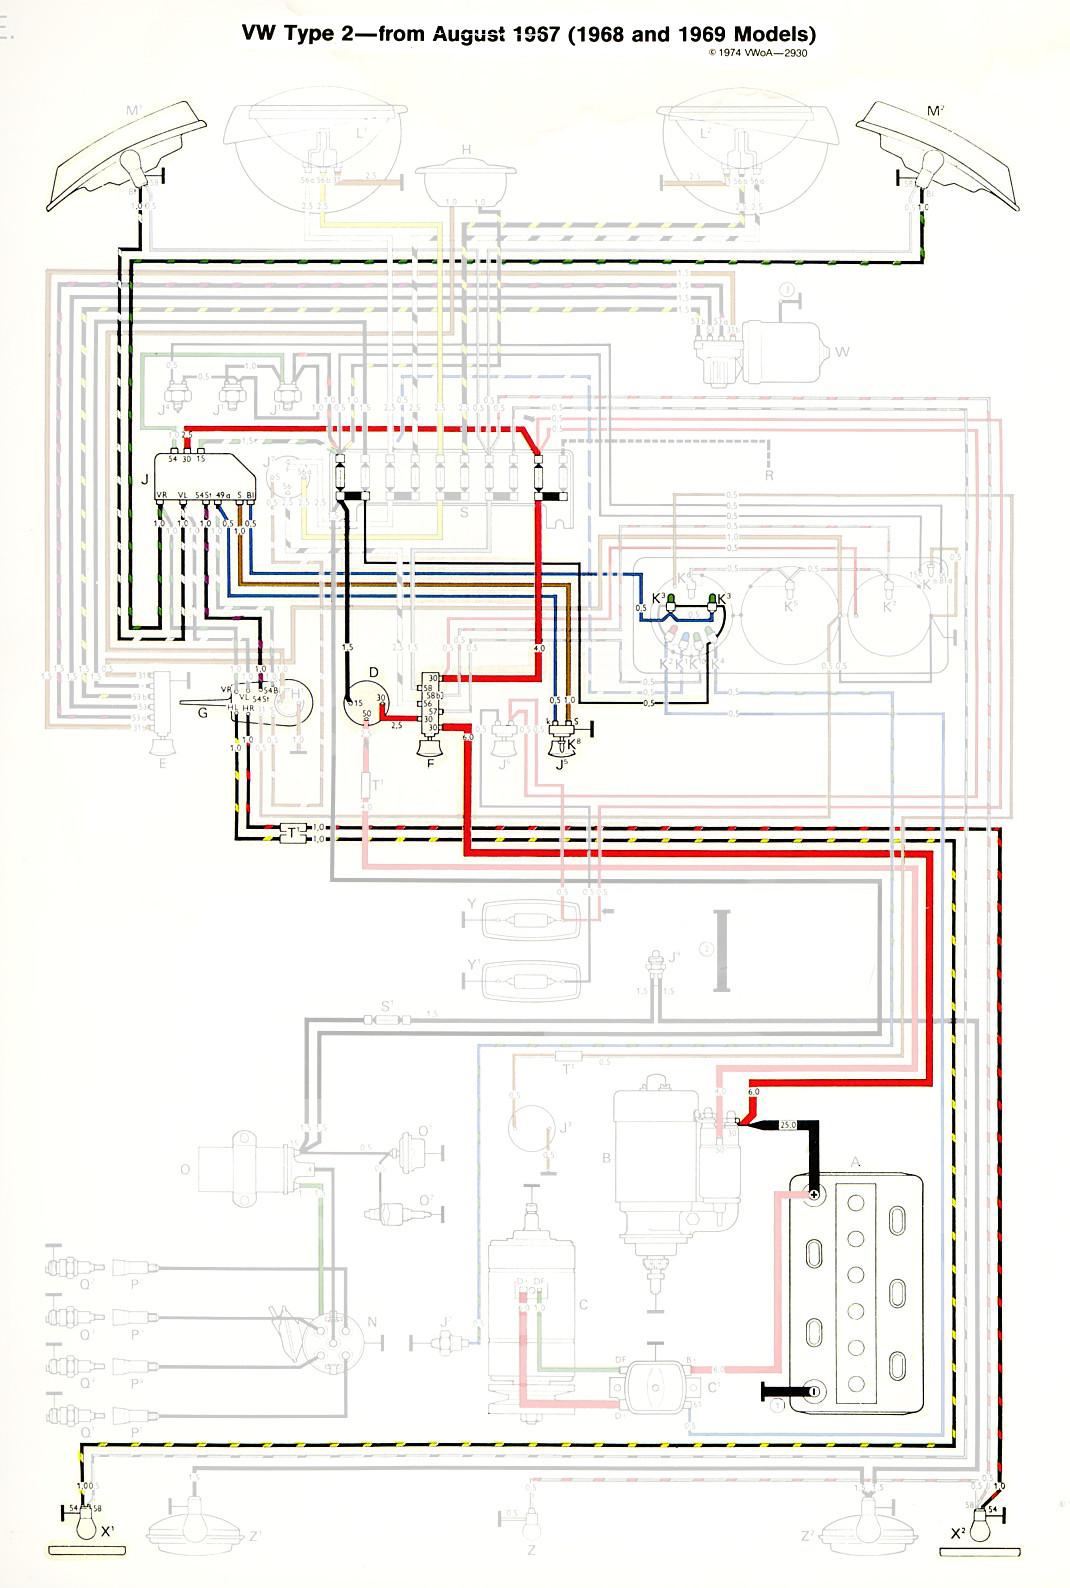 Vw Type 4 Alternator Wiring vw beetle alternator wiring ... Vw Type Alternator Wiring Diagram on vw generator wiring, toyota alternator diagram, vw alternator conversion, vw coil diagram, vw exhaust diagram, vw gti fuse diagram radio, vw alternator parts, vw buggy wiring-diagram, vw alternator fan diagram, vw voltage regulator wiring, vw distributor diagram, vw engine wiring, vw alternator hook up, 2001 vw passat radio wiring diagram, 74 beetle wiring diagram, vw bug wiring-diagram, vw sand rail wiring-diagram, vw beetle alternator, vw headlight wiring diagram,